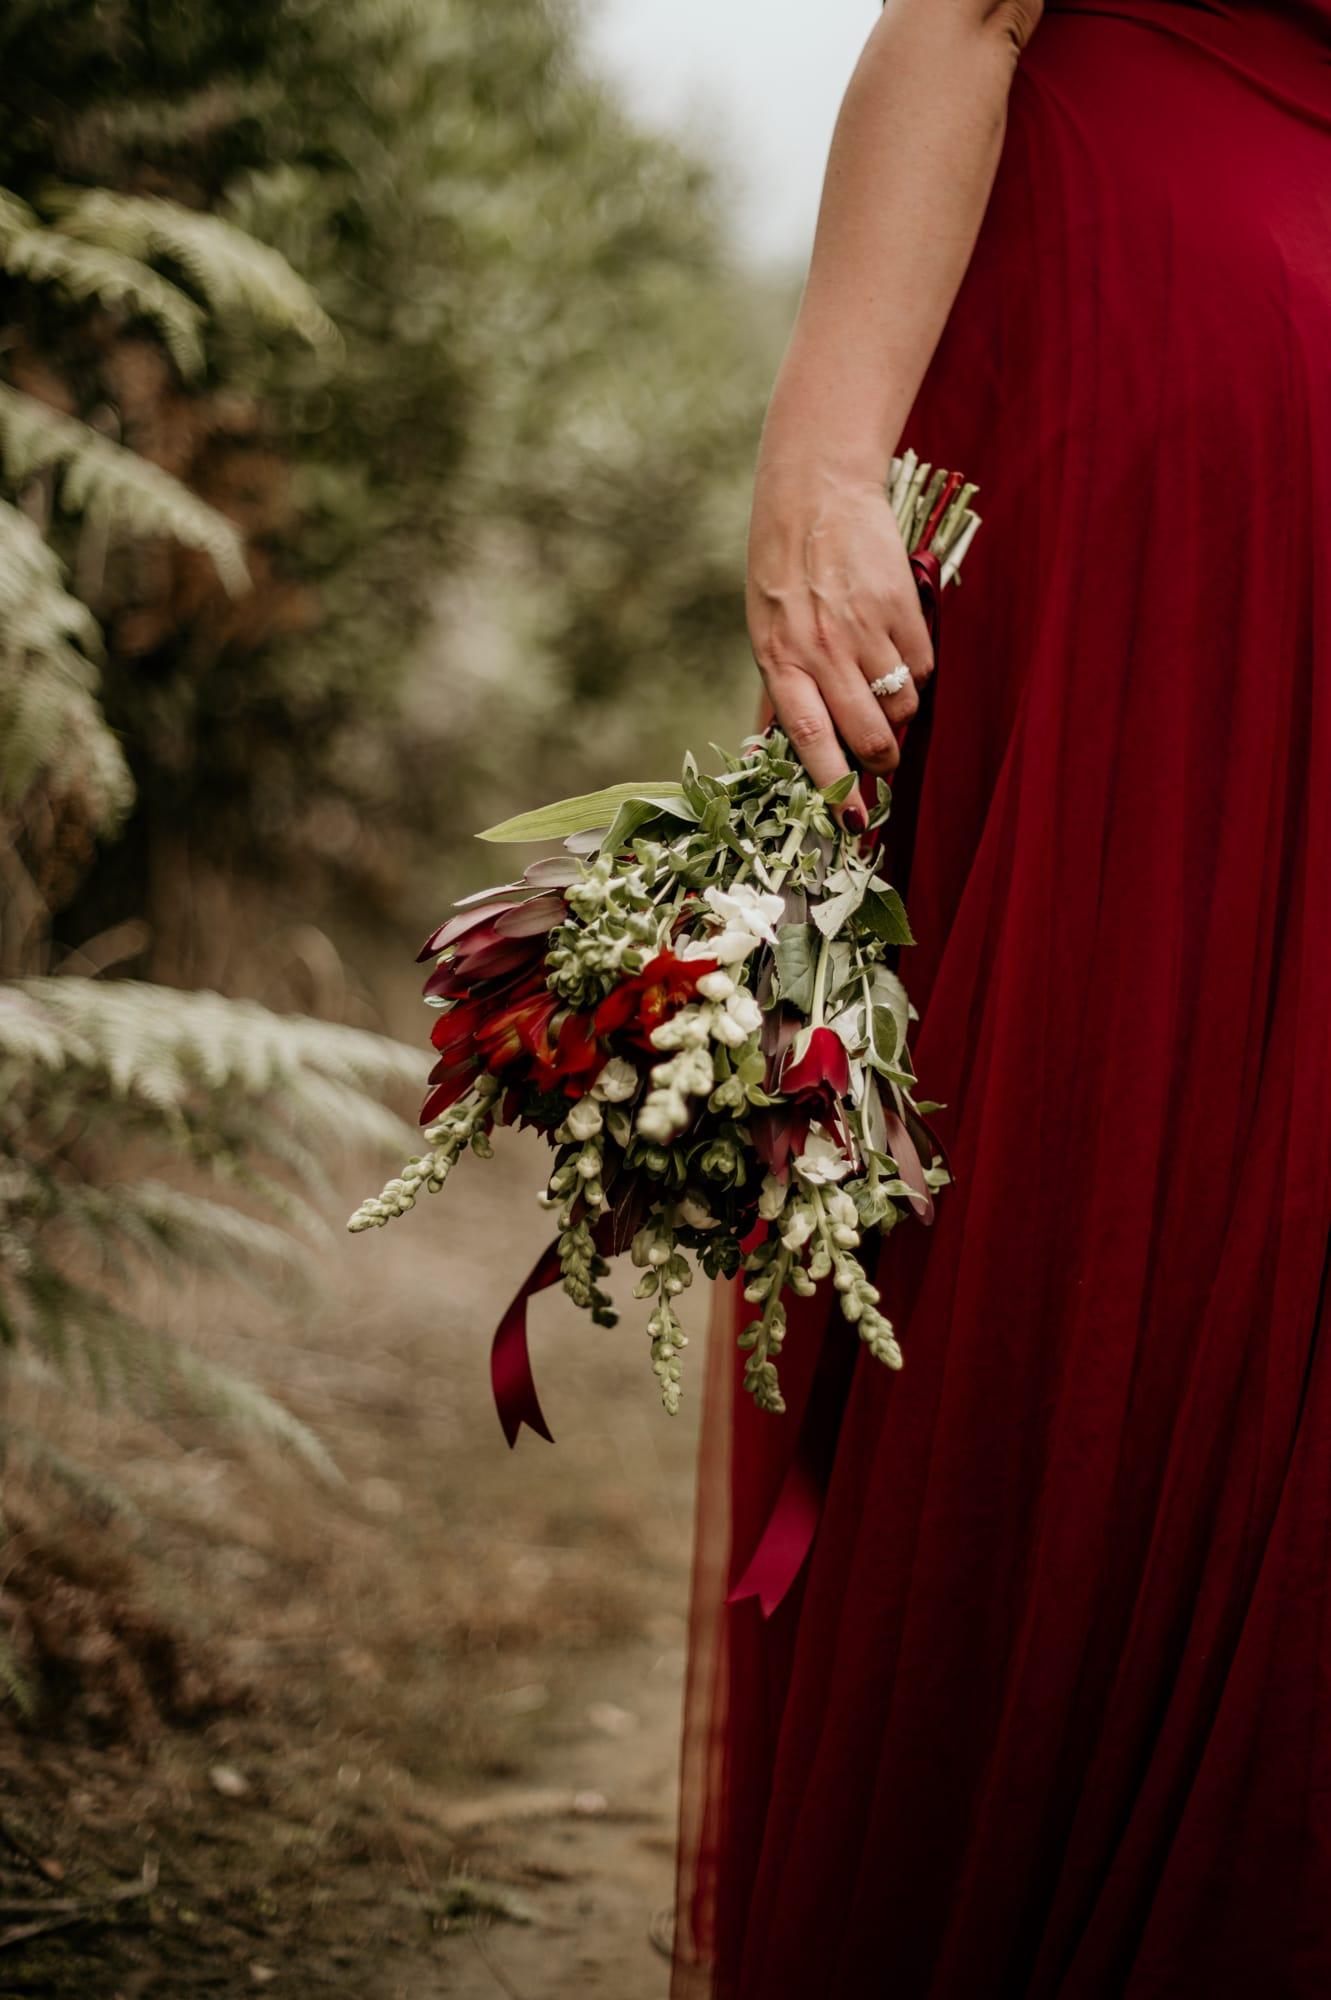 wesley-lanie-george-fernridge-engagement-June-Richards-Photography-Destination-Weddings-Elopements-Garden-Route-24